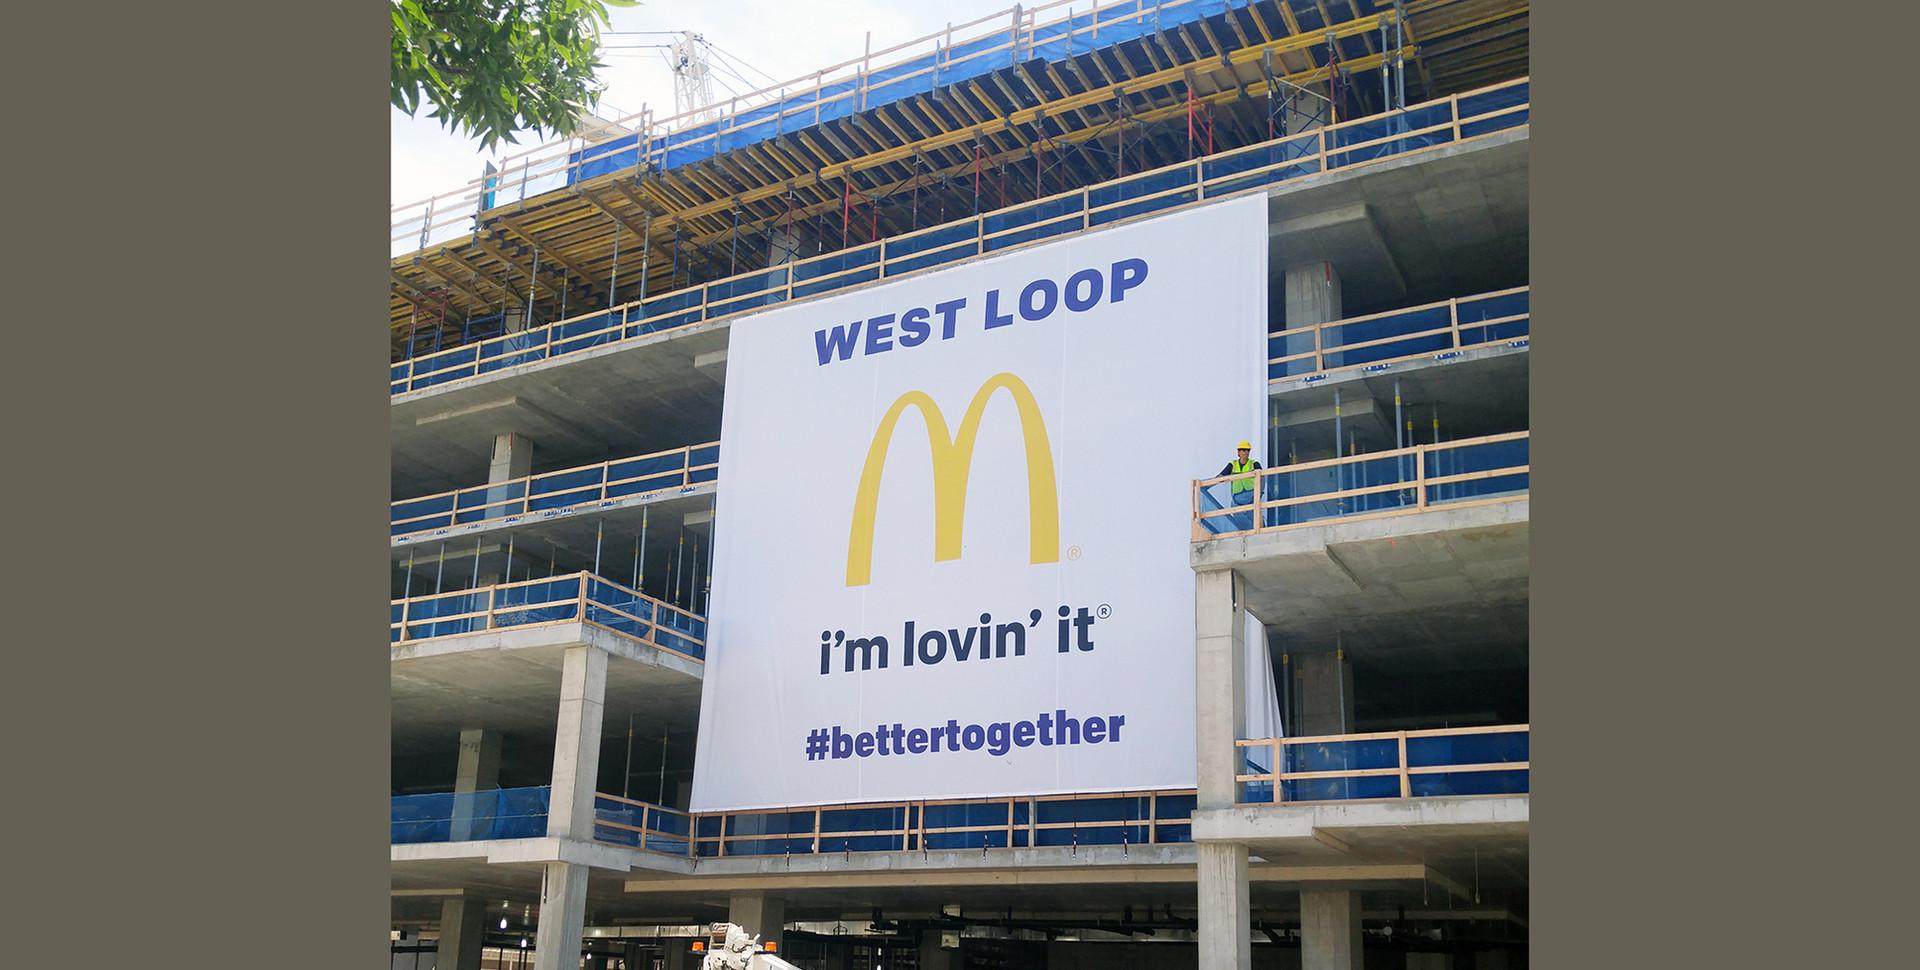 McDonalds_West_Loop_Angle_Banner_Ret.jpg